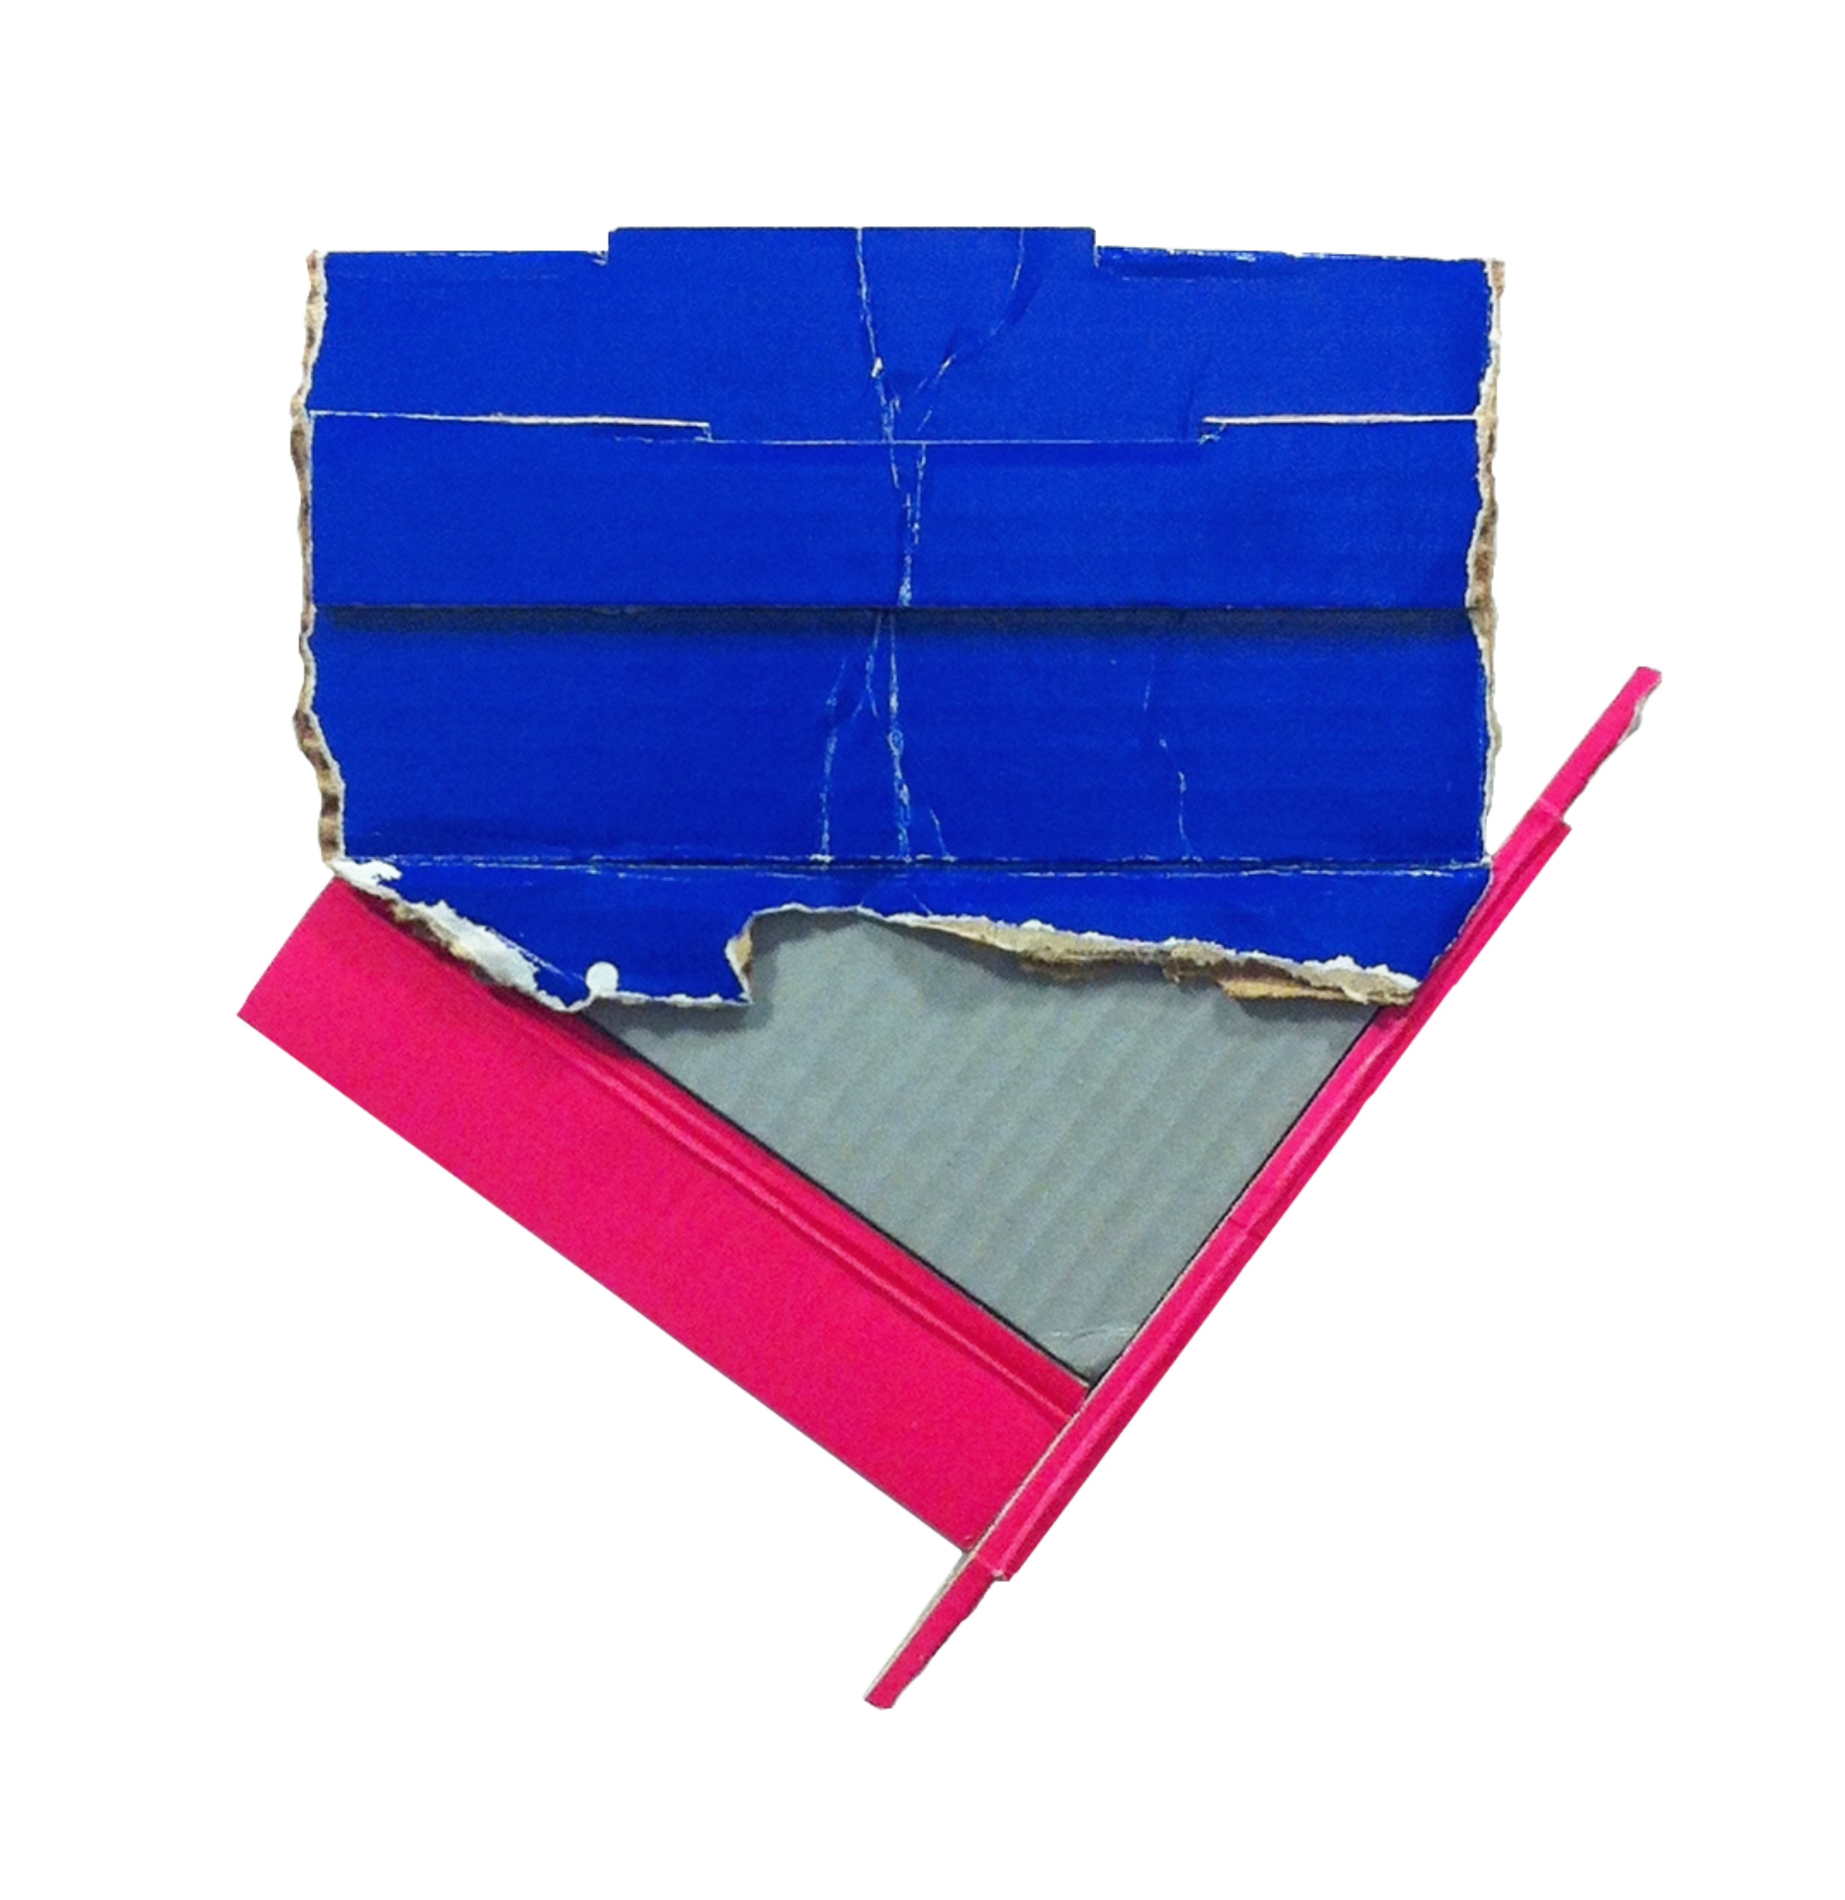 Stillpoint  , 2015  found (unpainted) cardboard, foamcore  9.25L x 8.75W x 1D inches